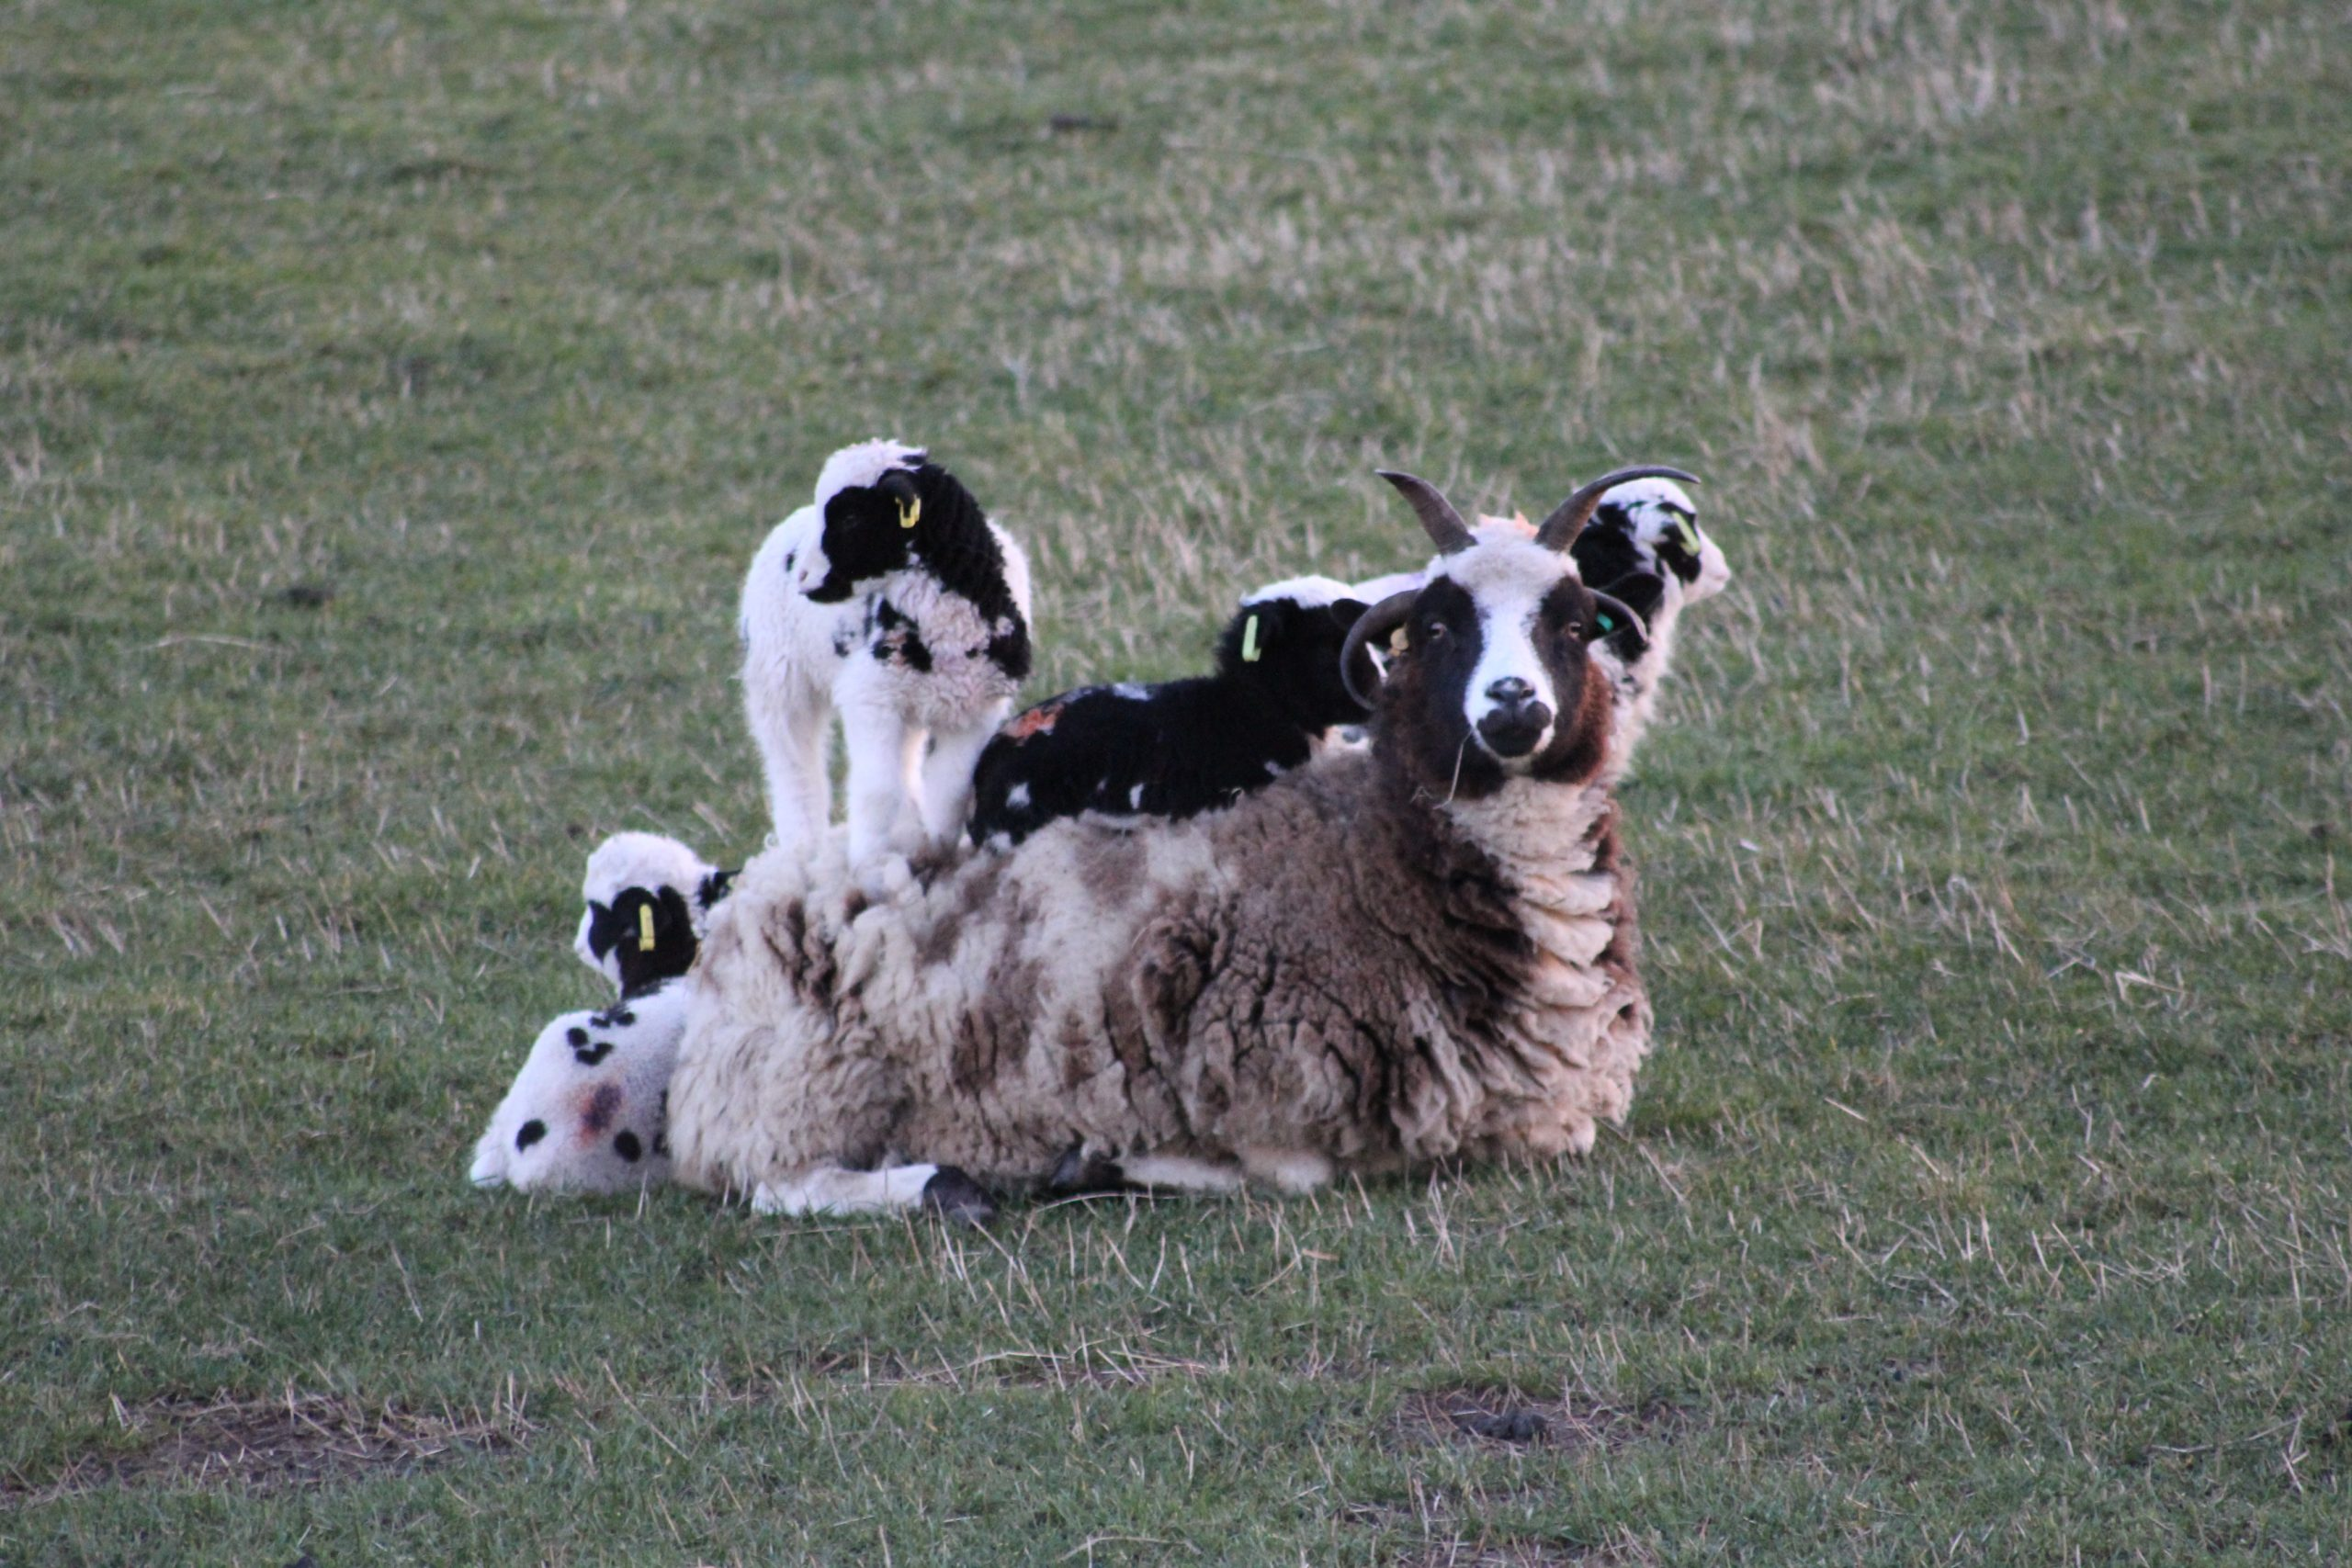 Ewe with lambs climbing on her